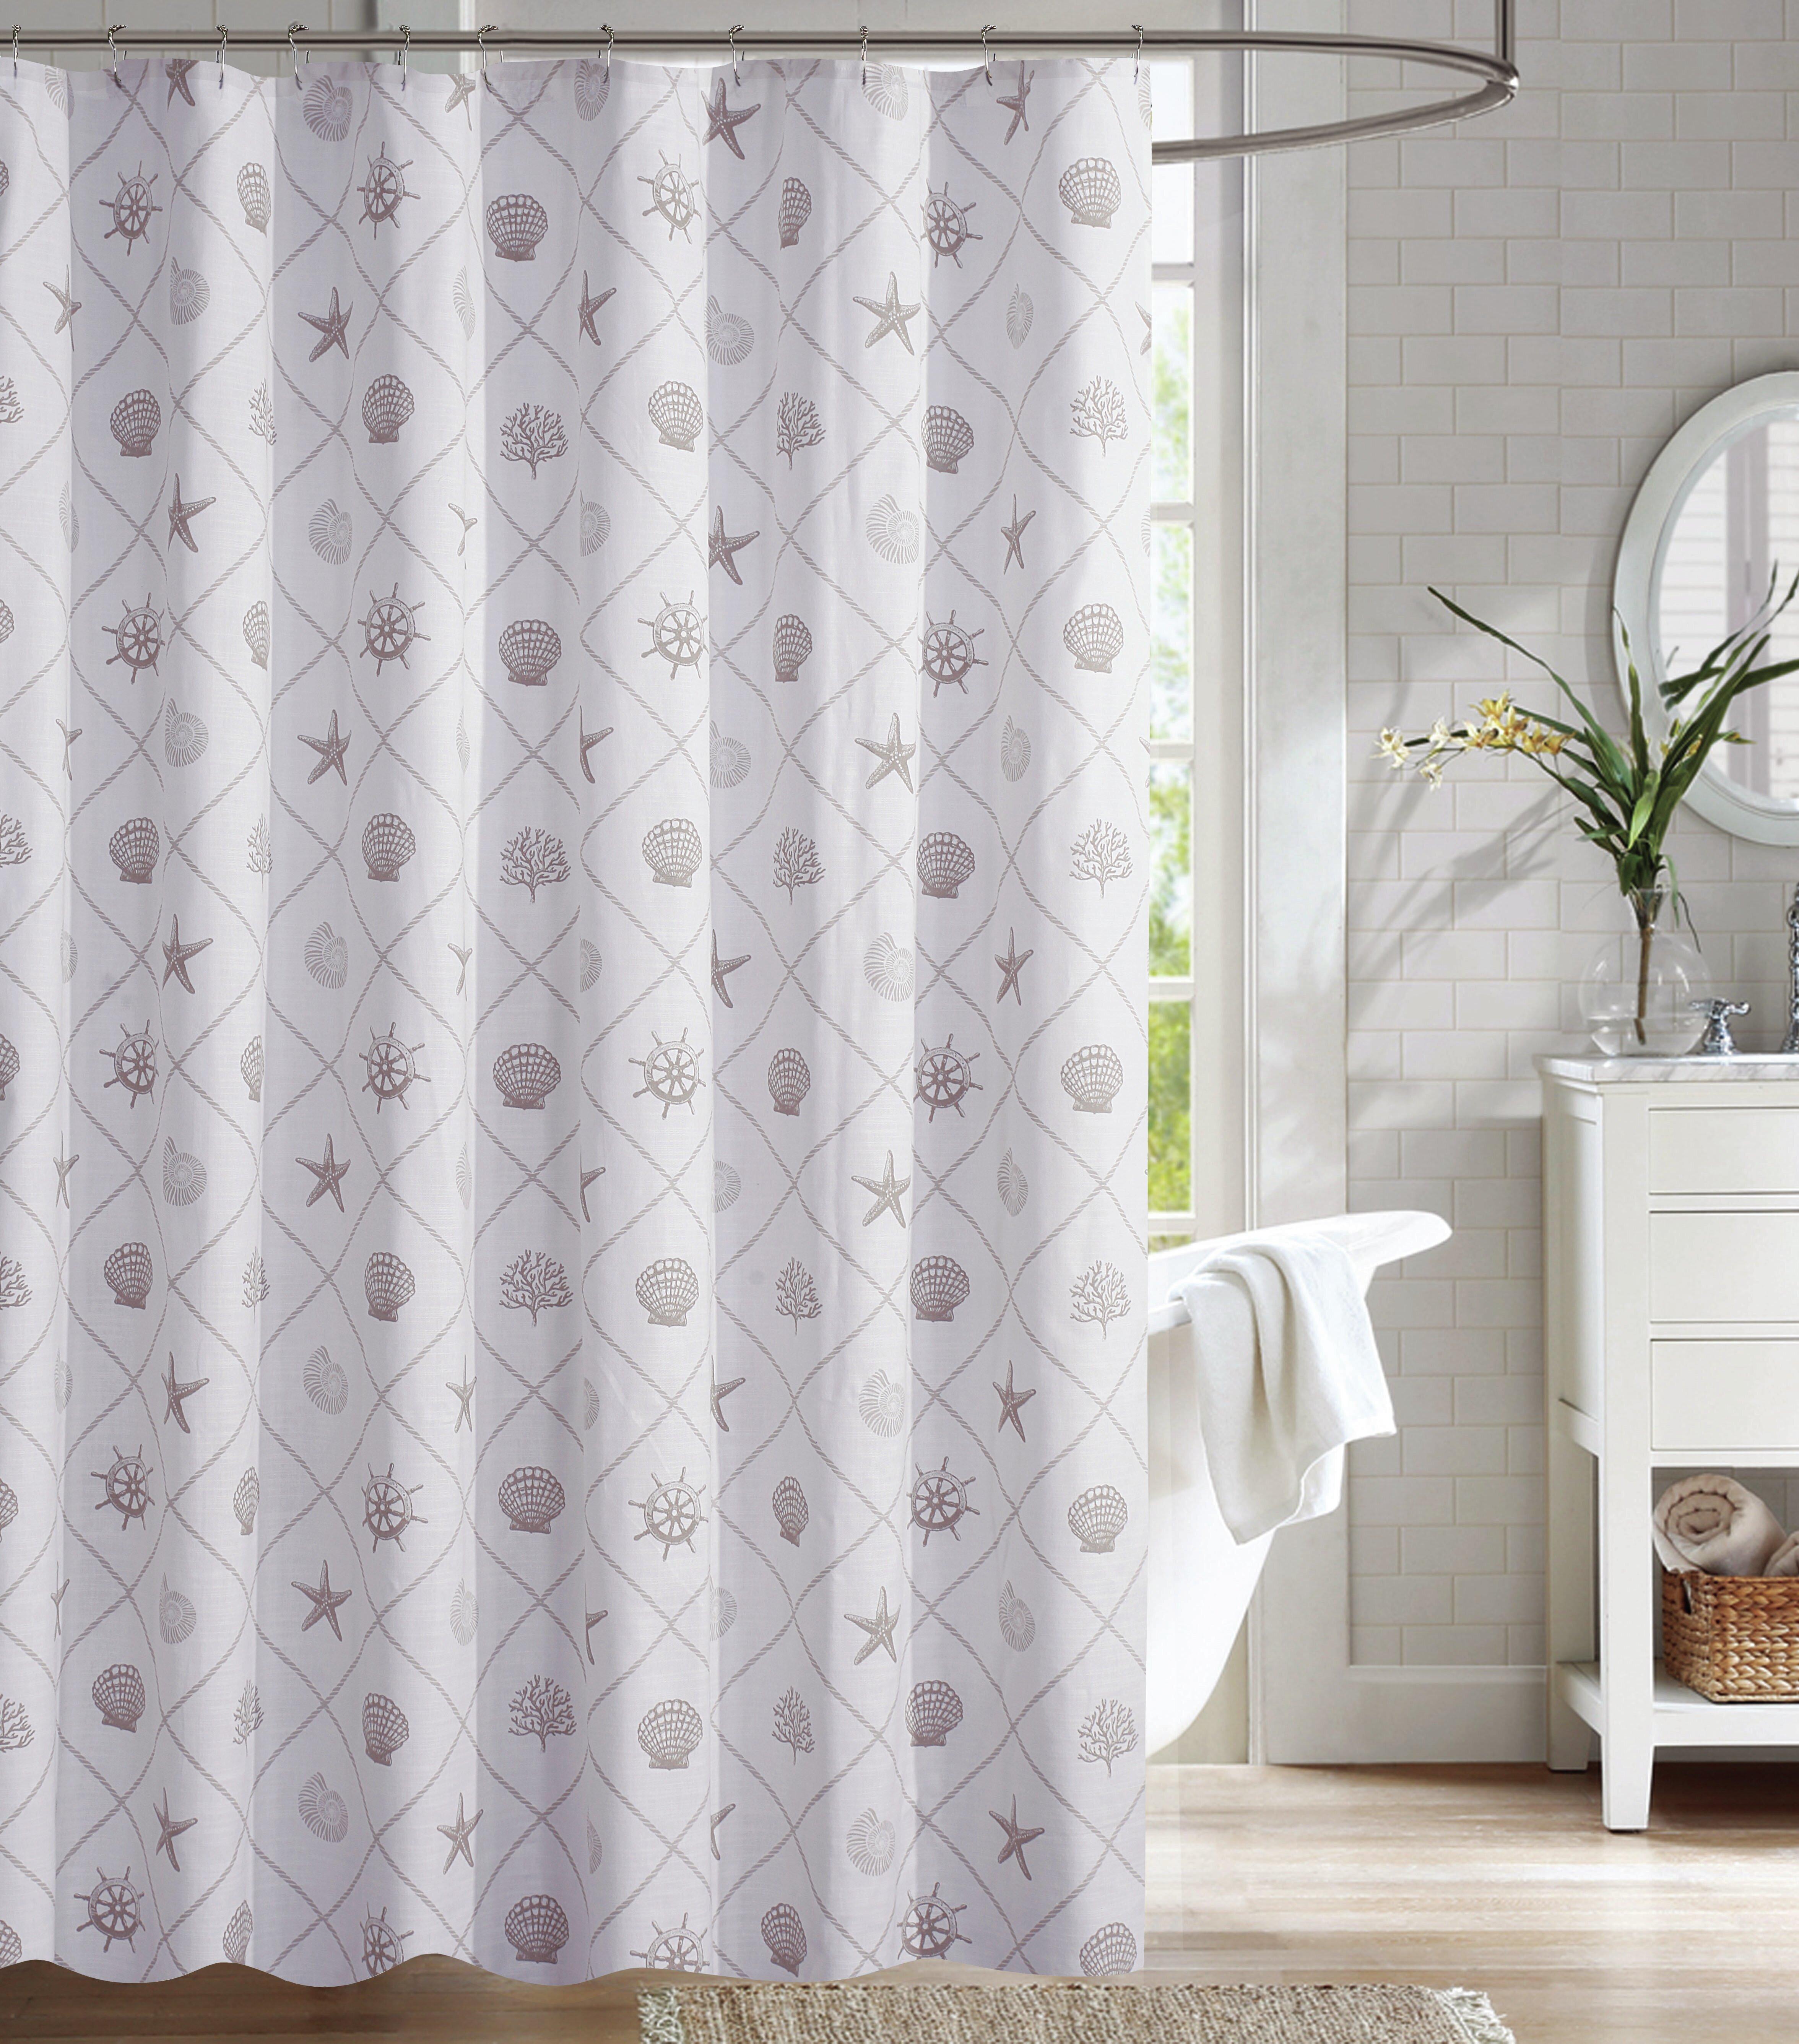 Highland Dunes Nedra Coastal Trellis 100 Cotton Shower Curtain Reviews